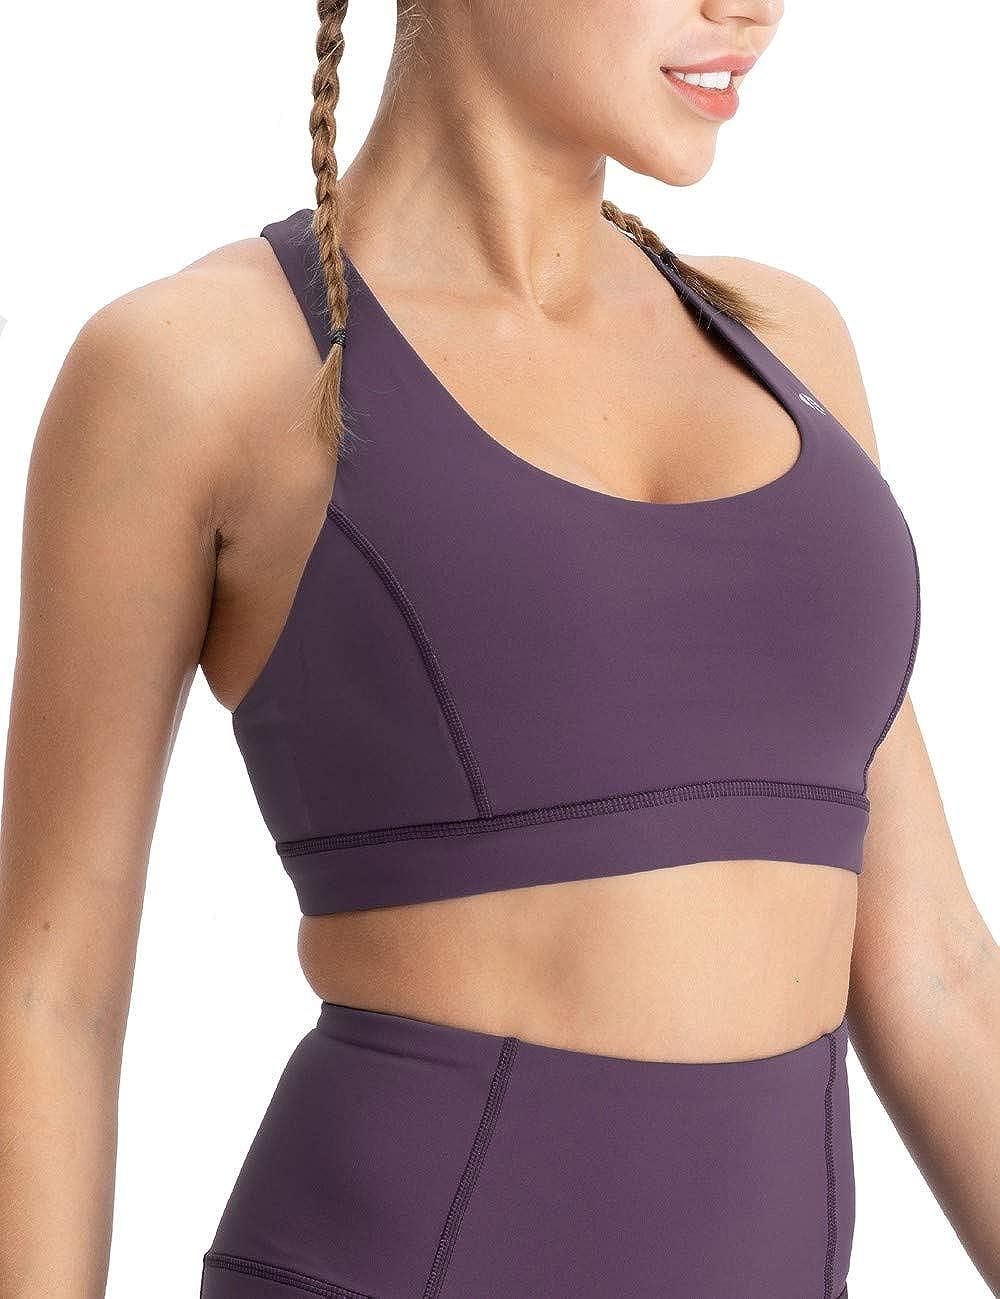 coastal rose Womens Yoga Bra Top Strappy Back Push Up Crop Sports Bra Activewear